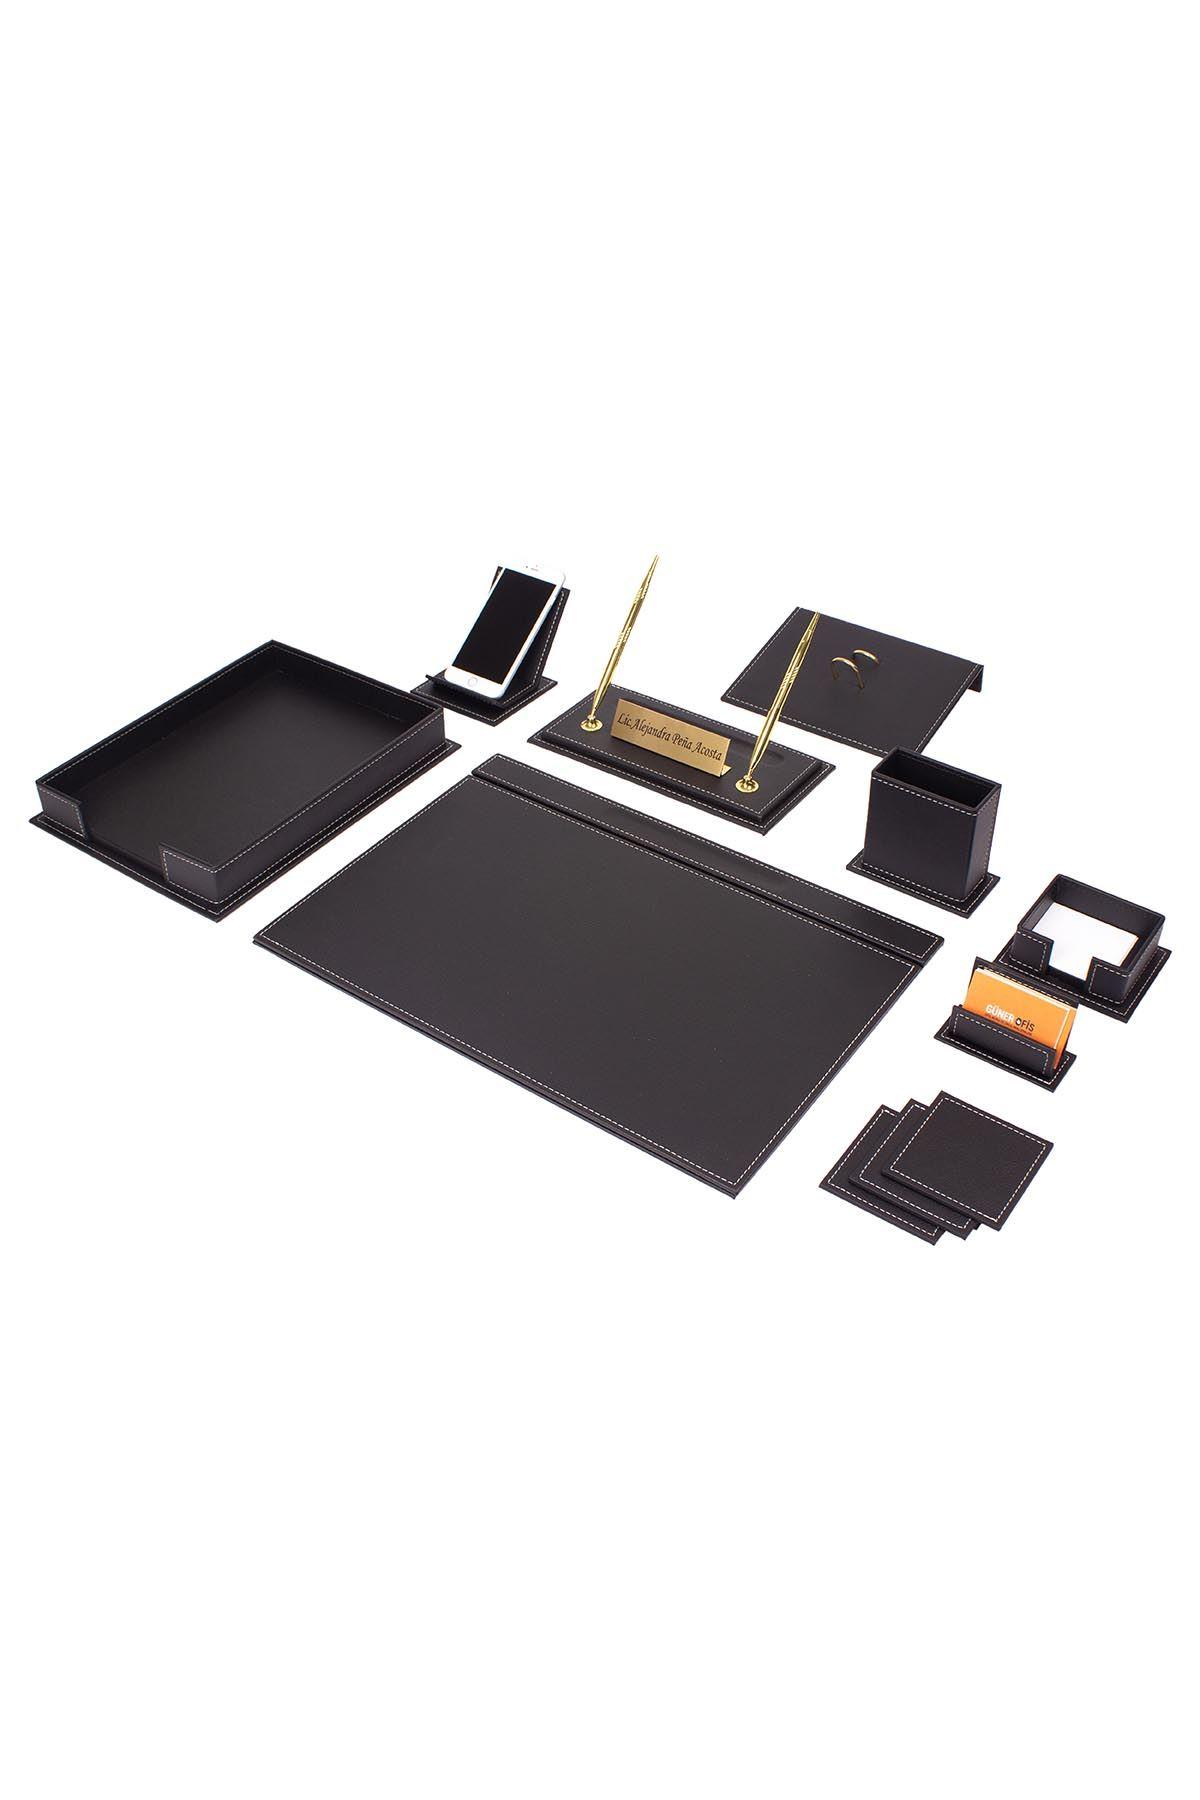 Vega Leather Desk Set Black 13 Accessories